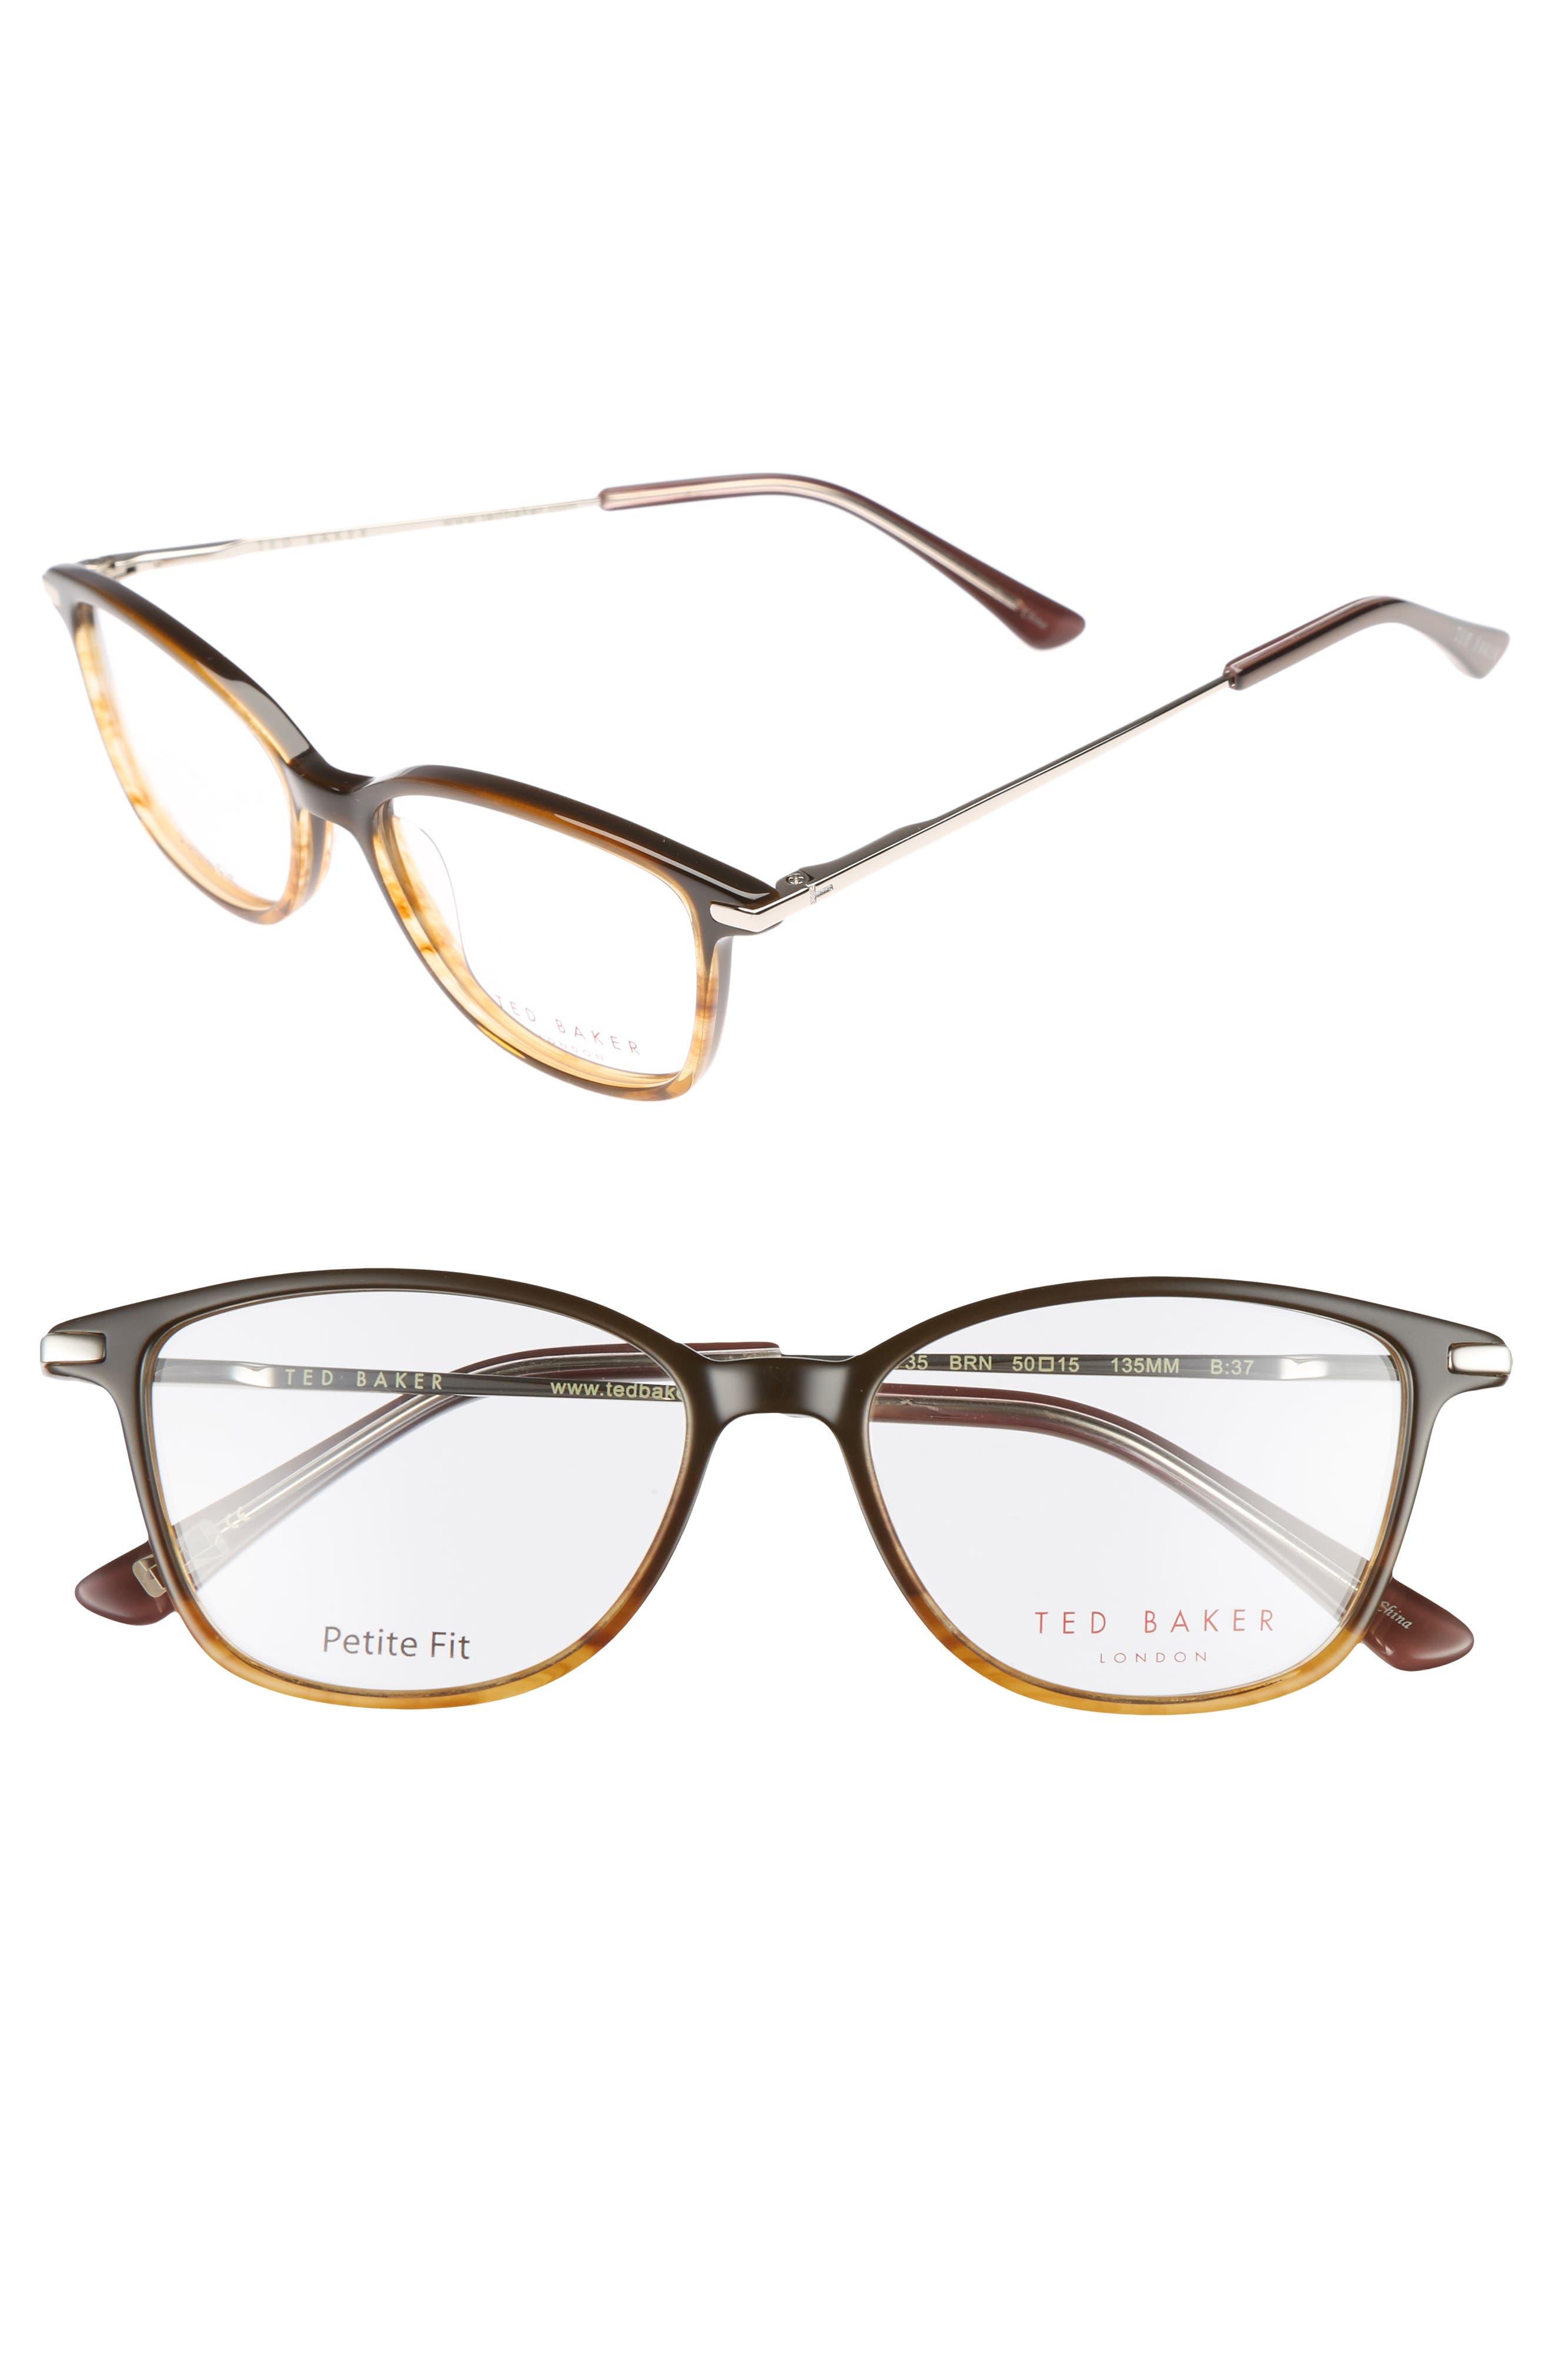 Petite Fit 50mm Optical Glasses,                         Main,                         color, Brown